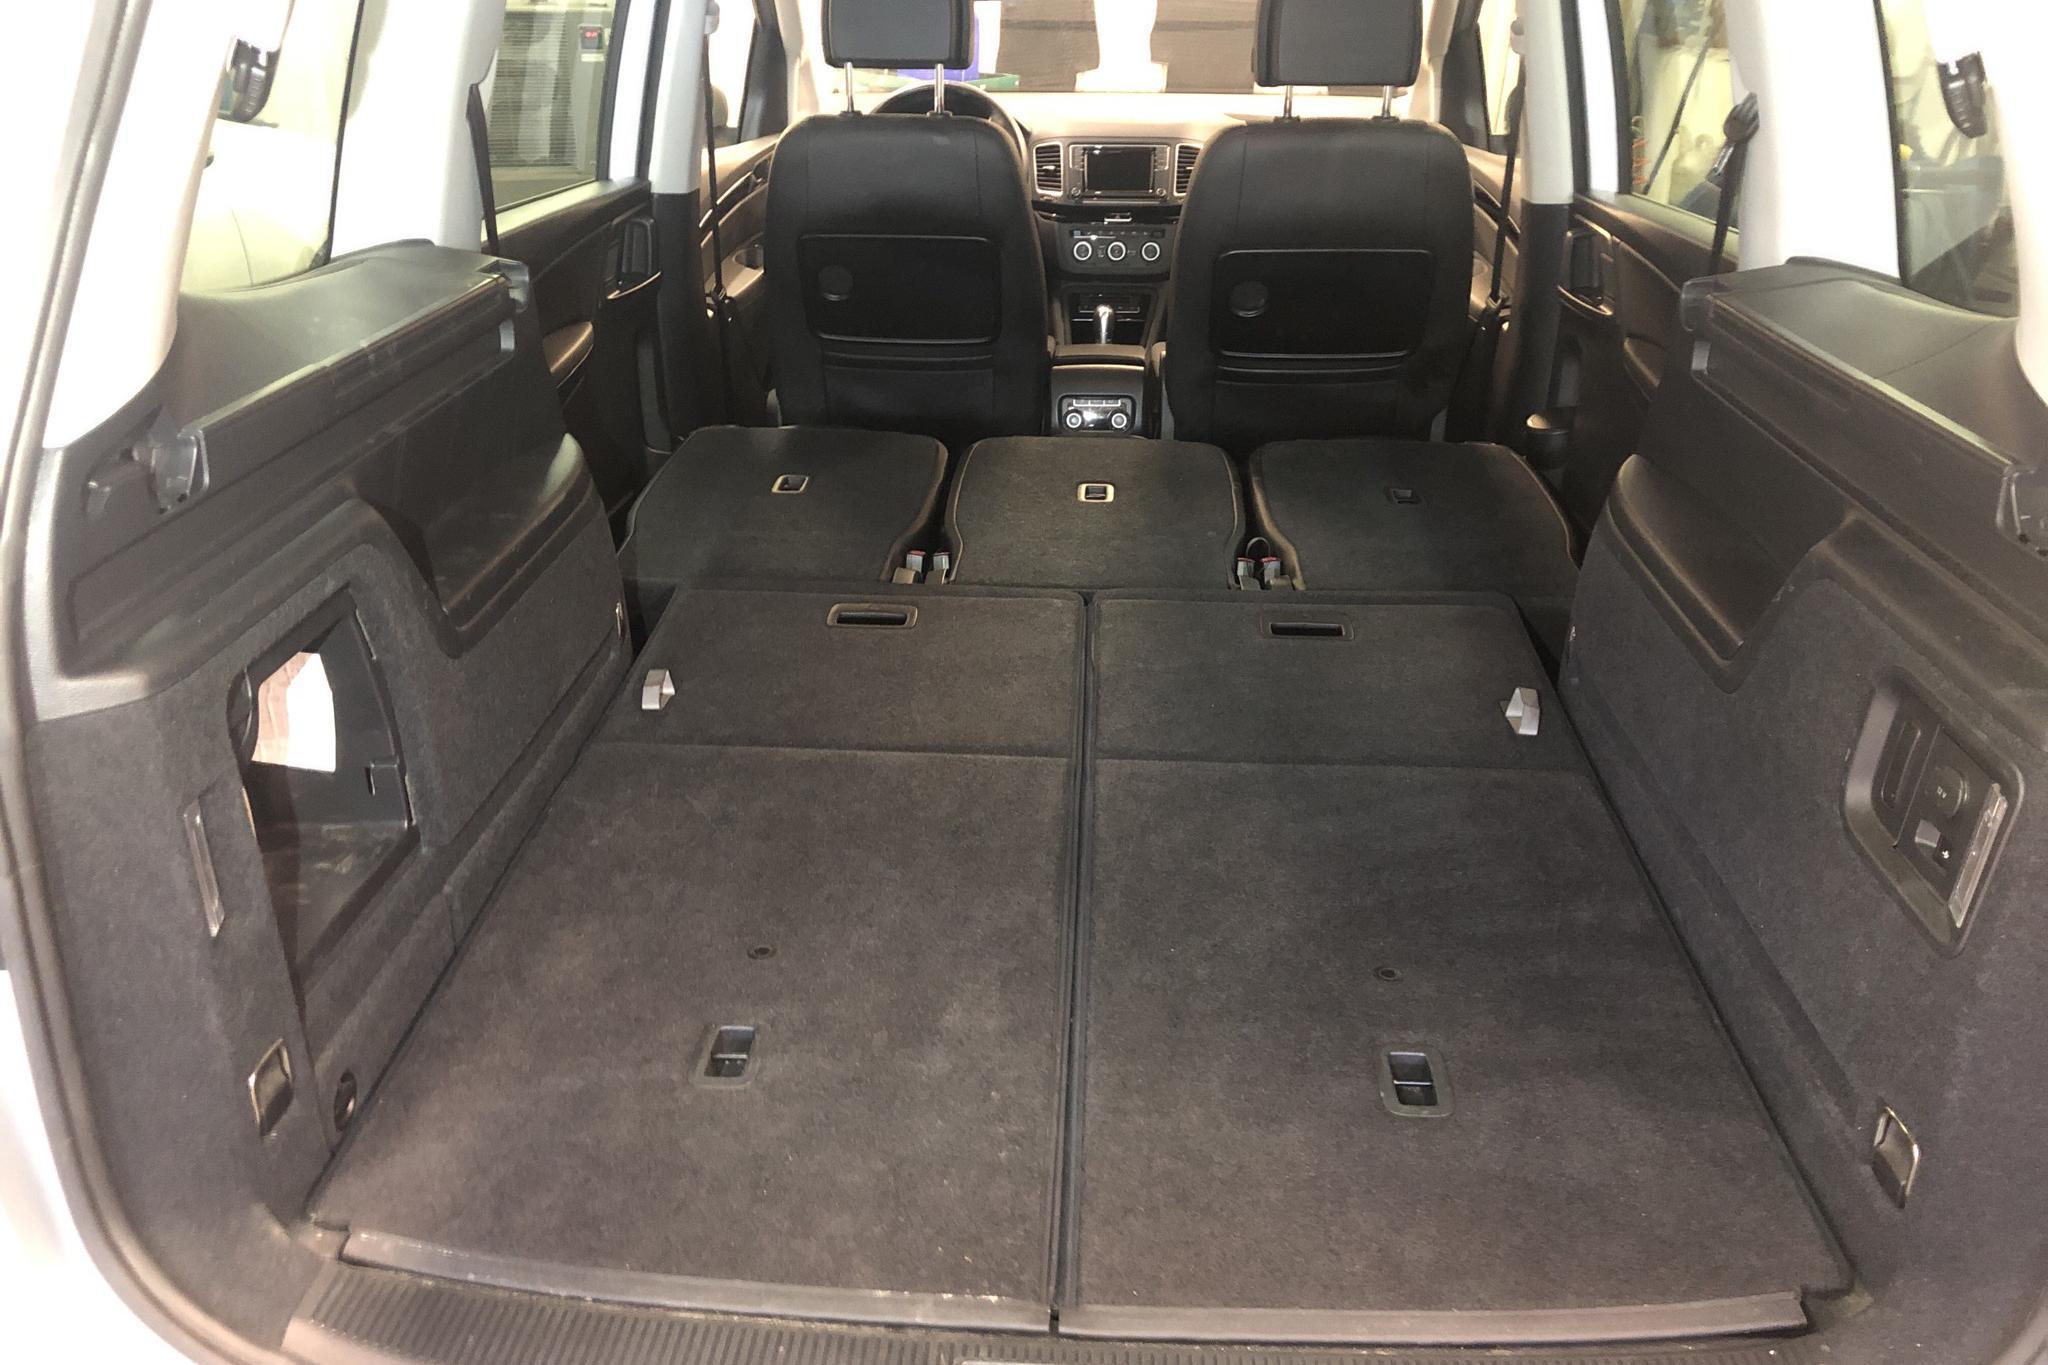 VW Sharan 2.0 TDI 4Motion (184hk) - 43 570 km - Automatic - silver - 2017